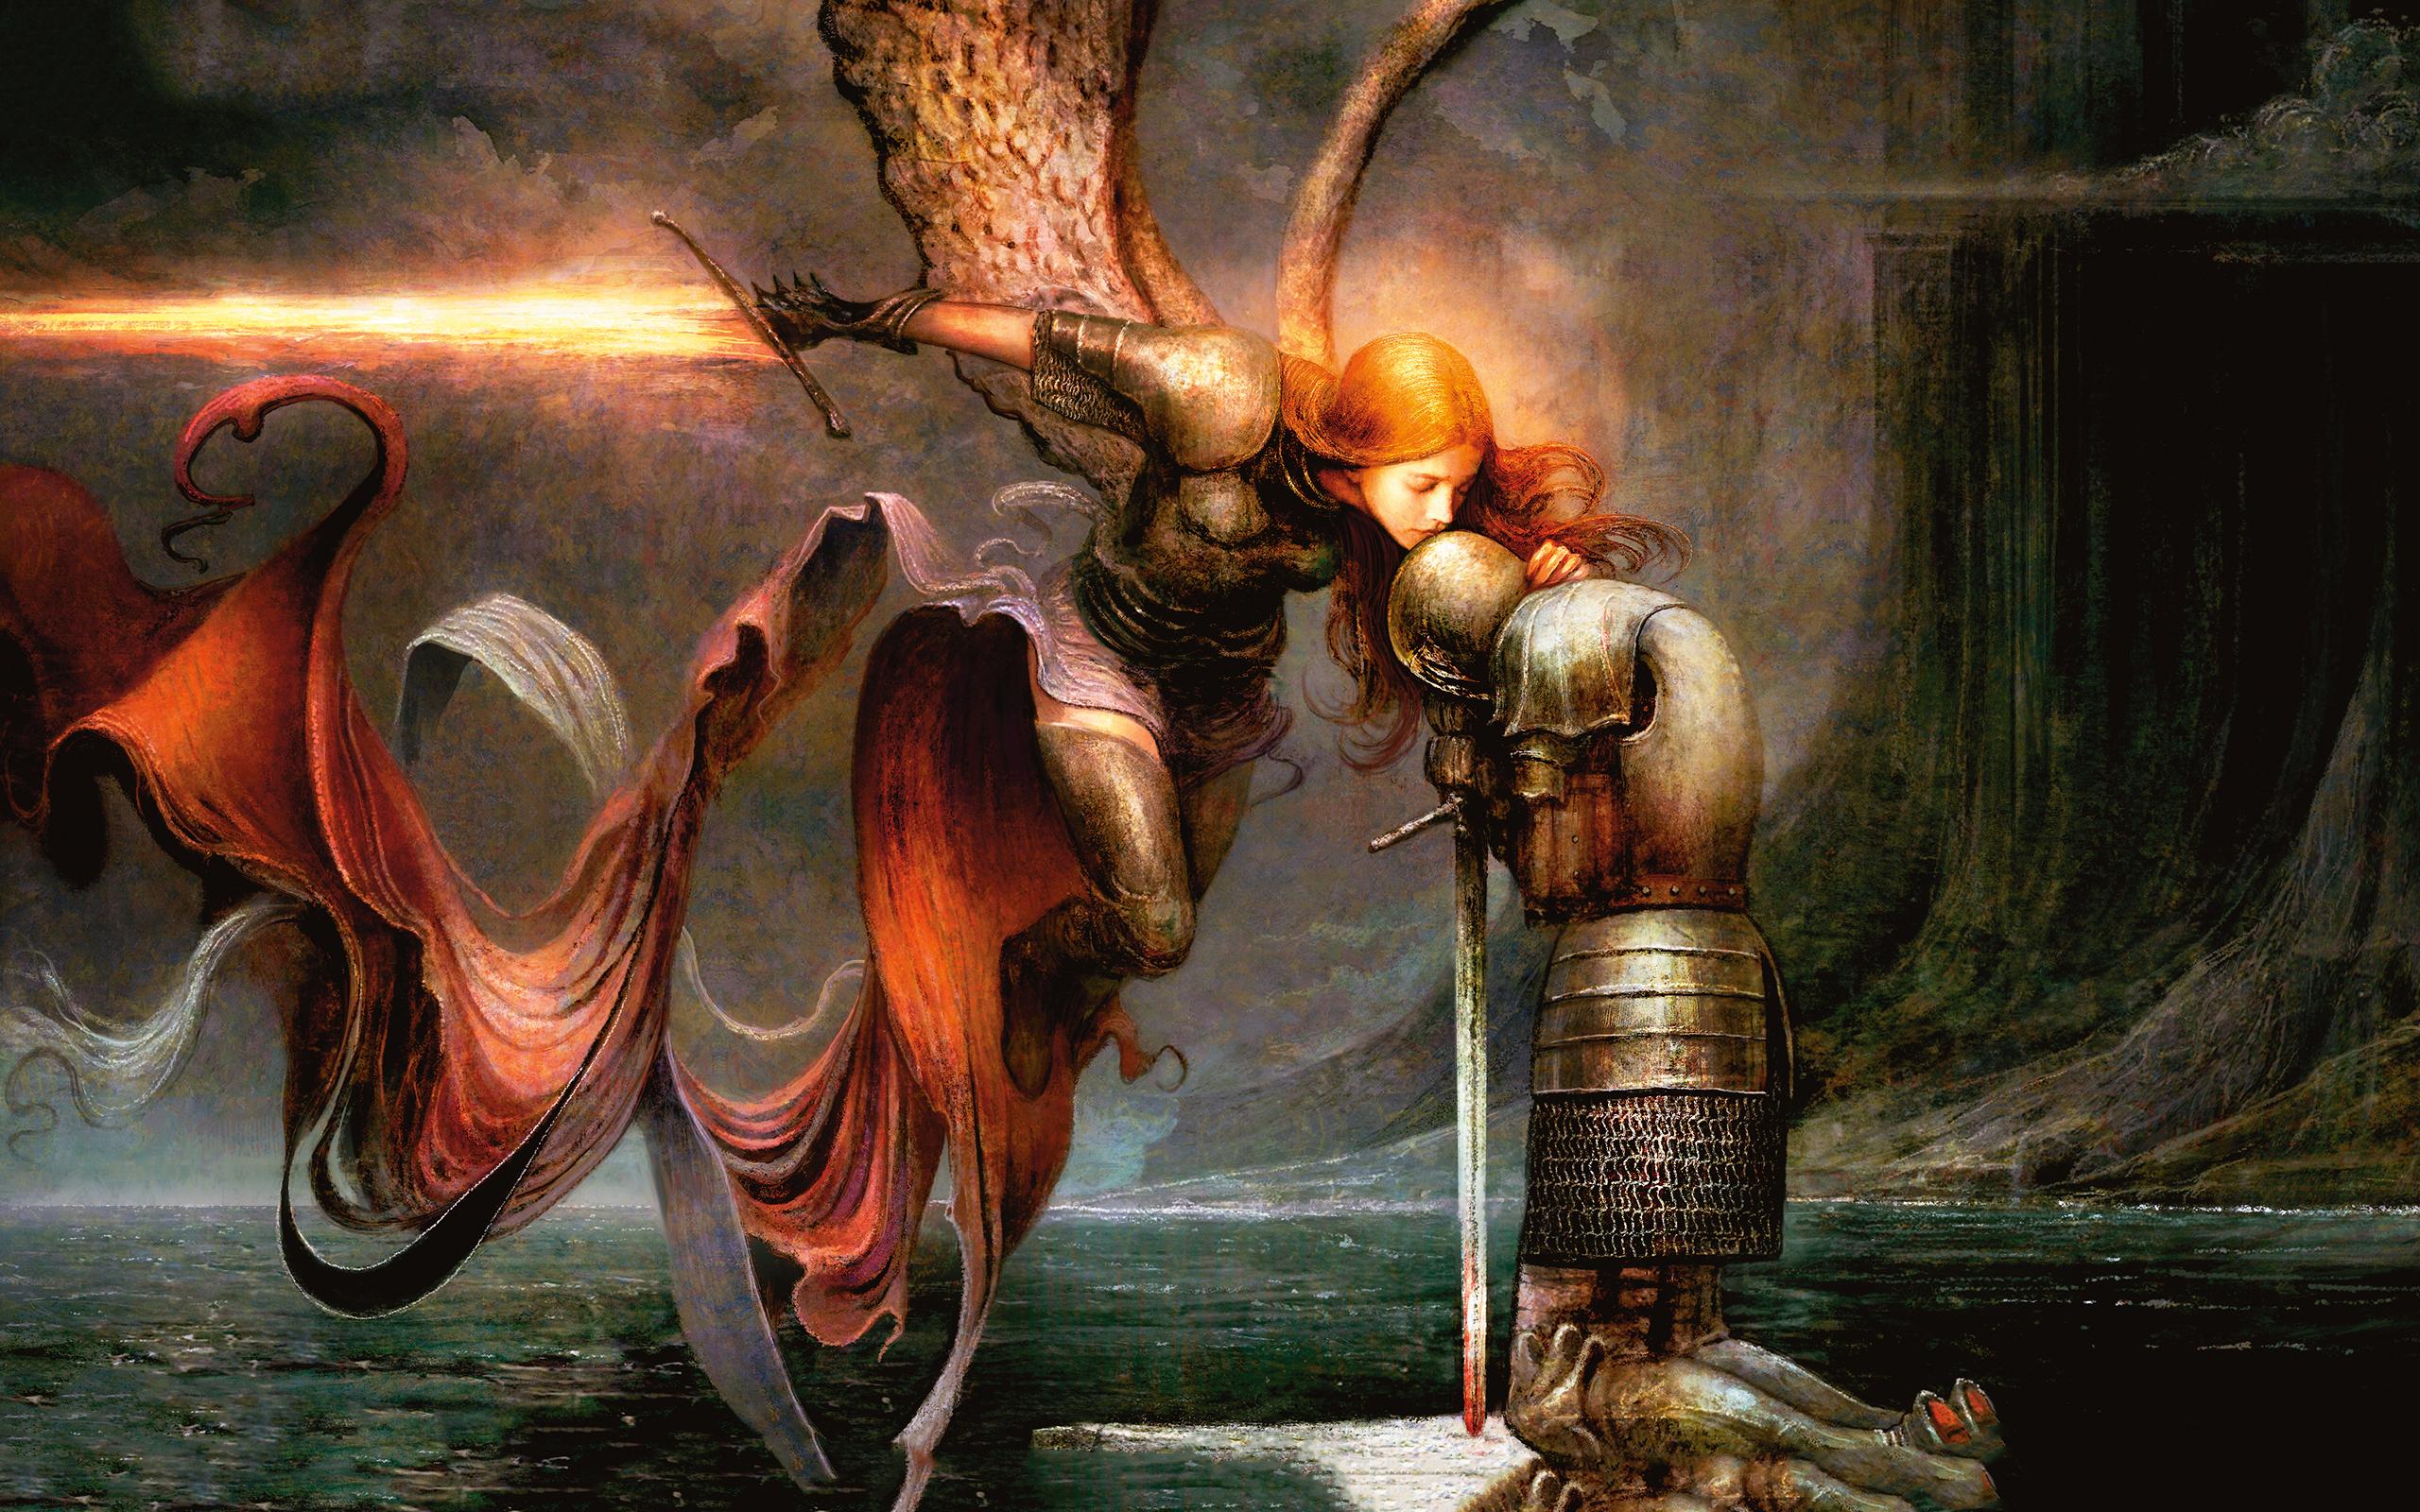 General 2560x1600 Magic: The Gathering Seb McKinnon fantasy art fantasy girl